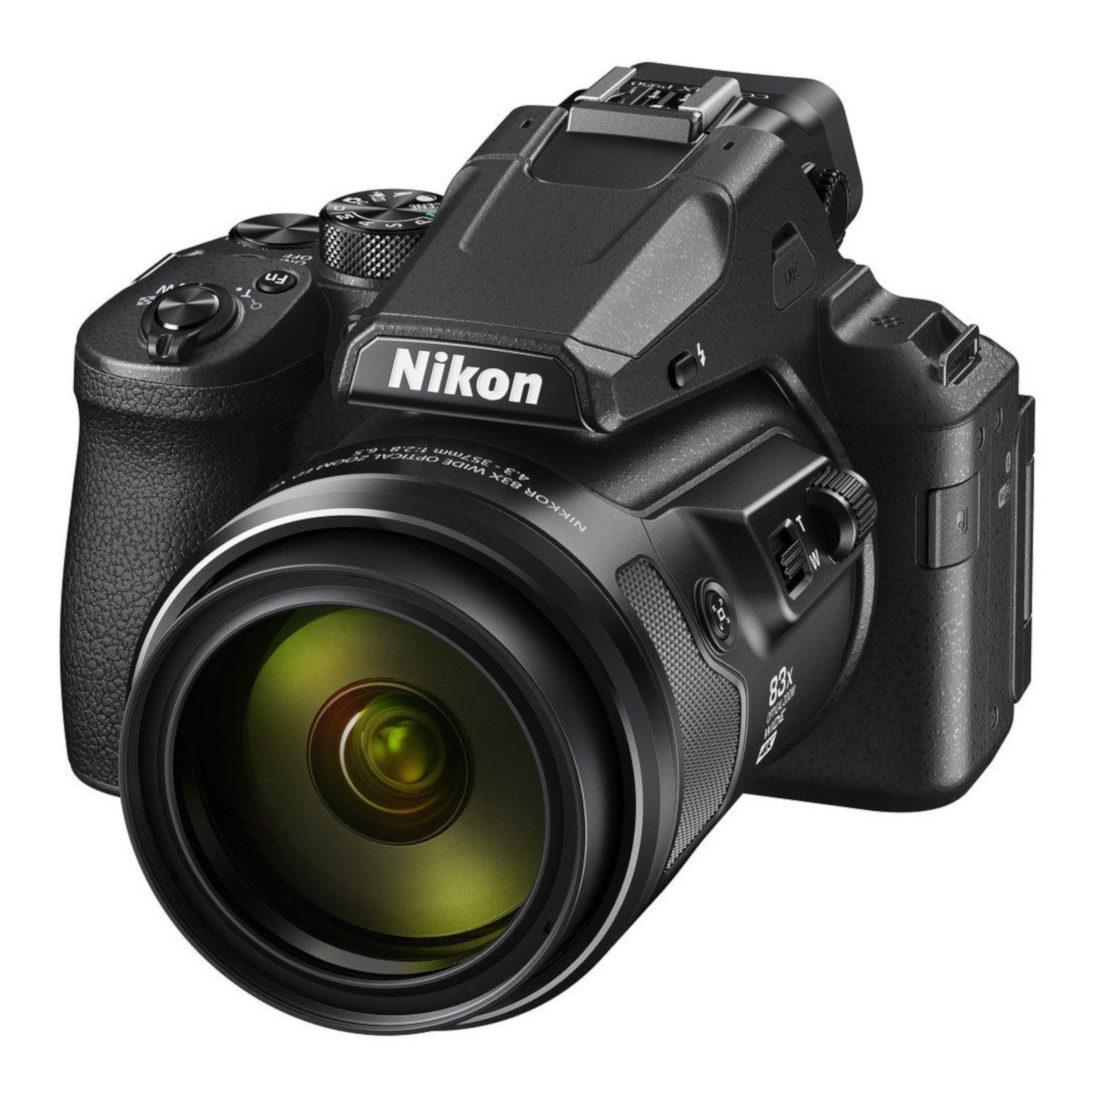 Nikon Coolpix P950 compact camera Zwart <br/>€ 899.00 <br/> <a href='https://www.cameranu.nl/fotografie/?tt=12190_474631_241358_&r=https%3A%2F%2Fwww.cameranu.nl%2Fnl%2Fp3159112%2Fnikon-coolpix-p950-compact-camera-zwart%3Fchannable%3De10841.MzE1OTExMg%26utm_campaign%3D%26utm_content%3DCompact%2Bcamera%26utm_source%3DTradetracker%26utm_medium%3Dcpc%26utm_term%3DDigitale%2Bcamera%26apos%3Bs' target='_blank'>naar de winkel</a>